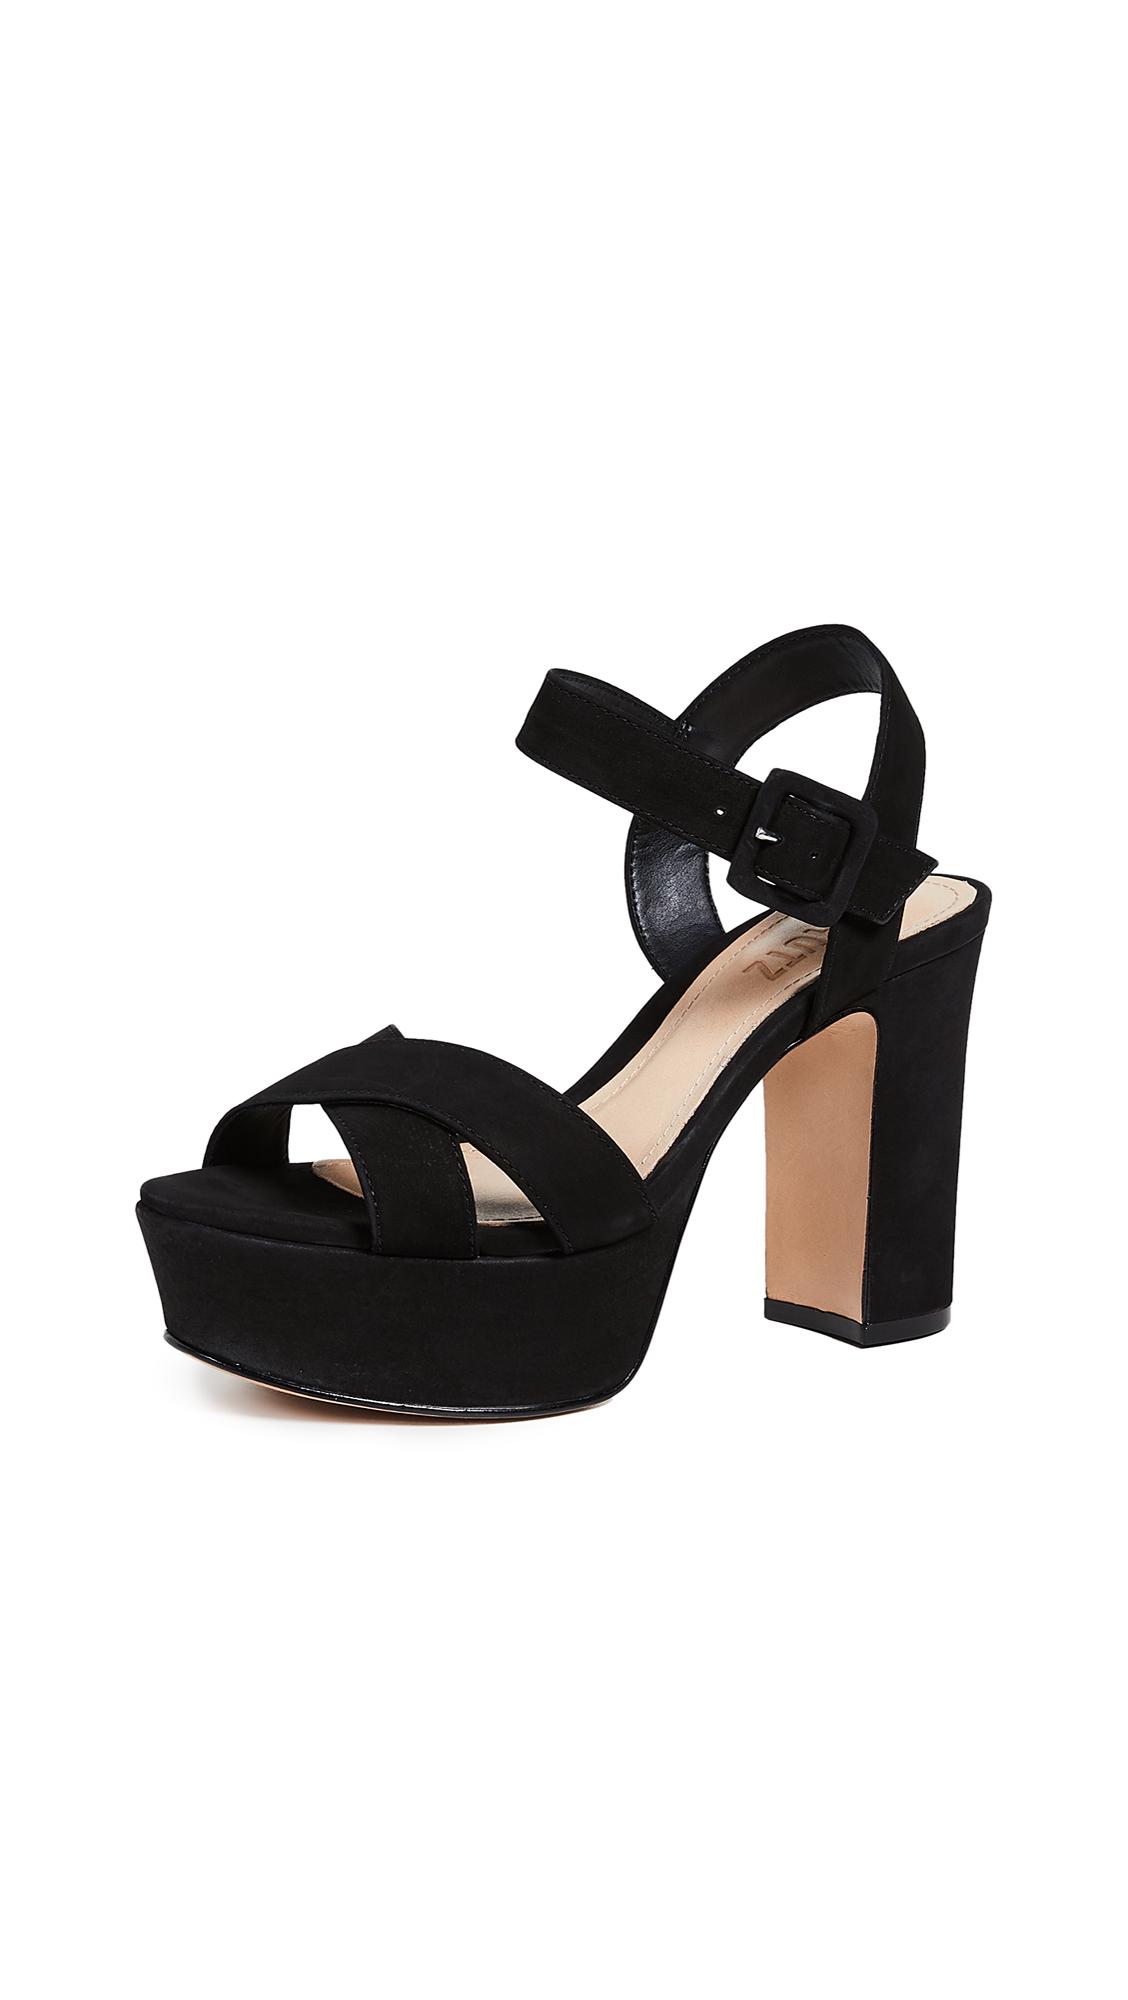 Schutz Tulia Platform Sandals